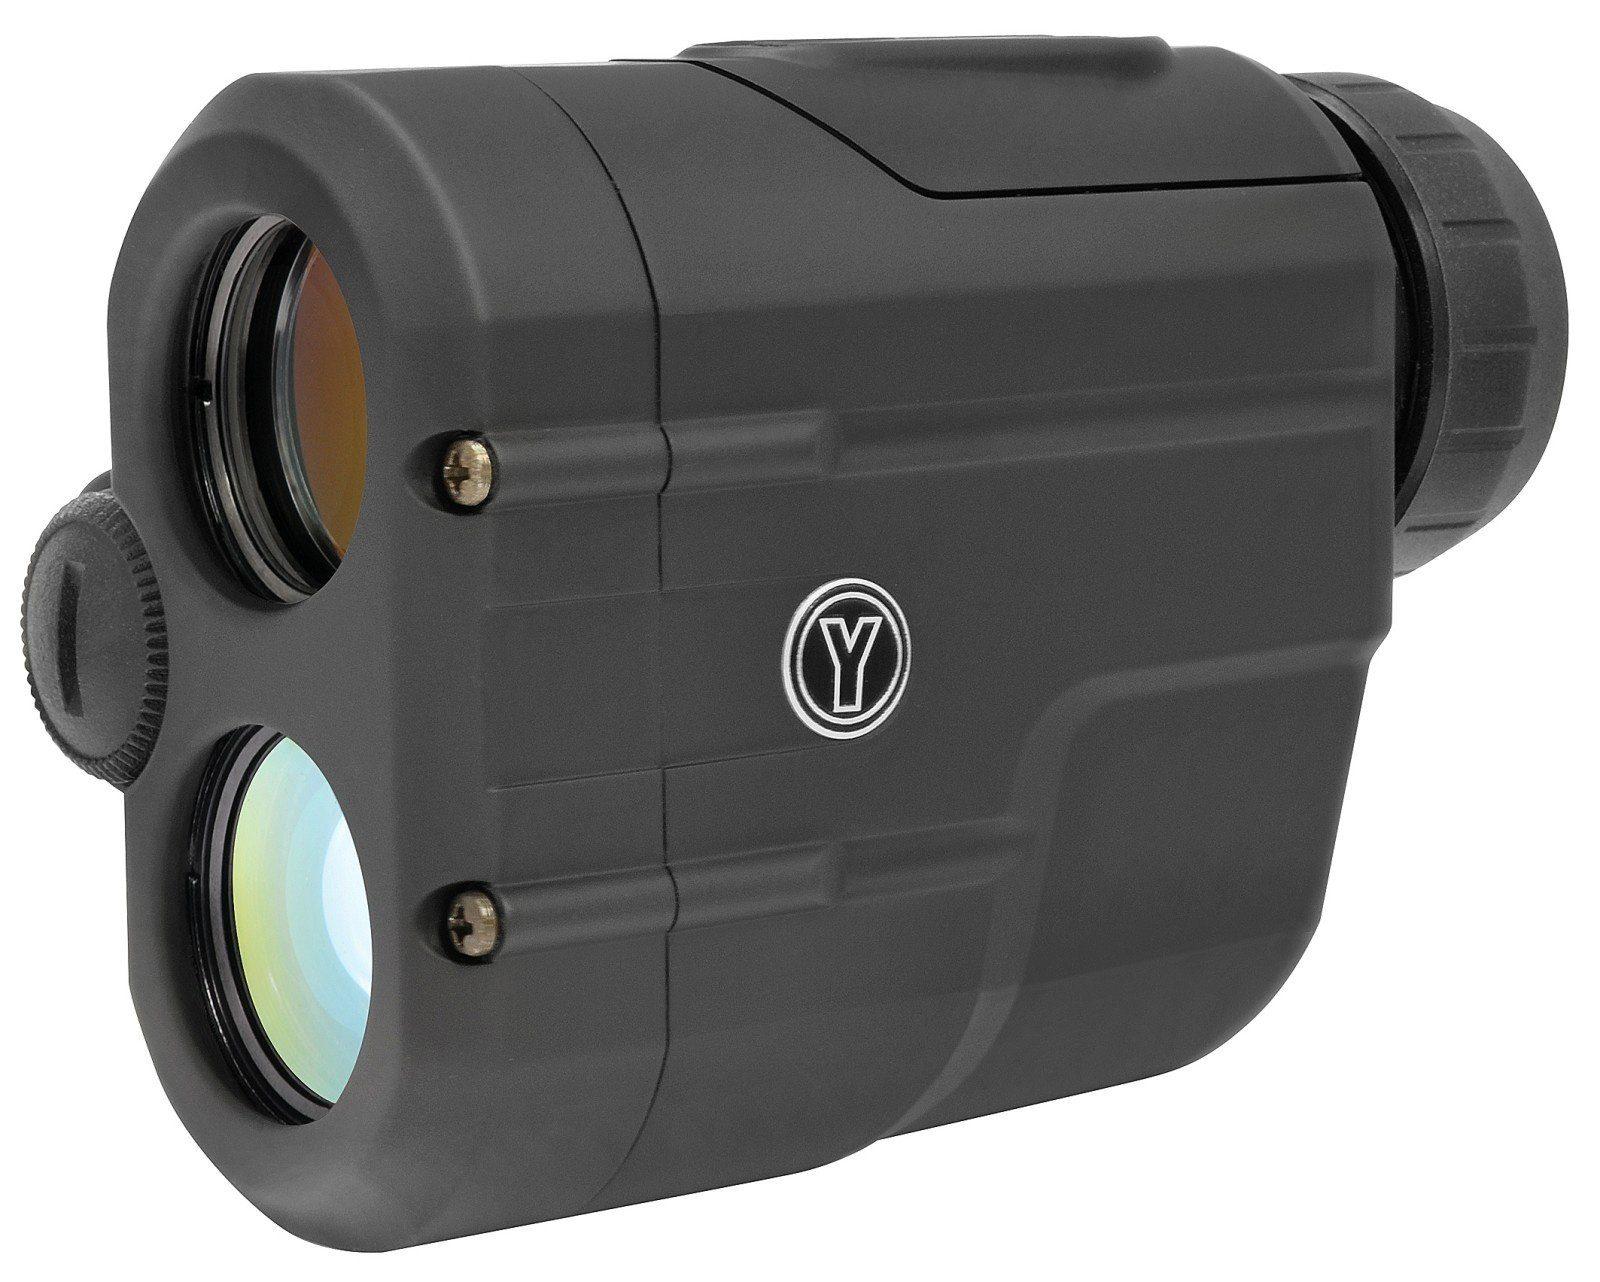 Makita Entfernungsmesser Günstig : Yukon entfernungsmesser extend lrs laser